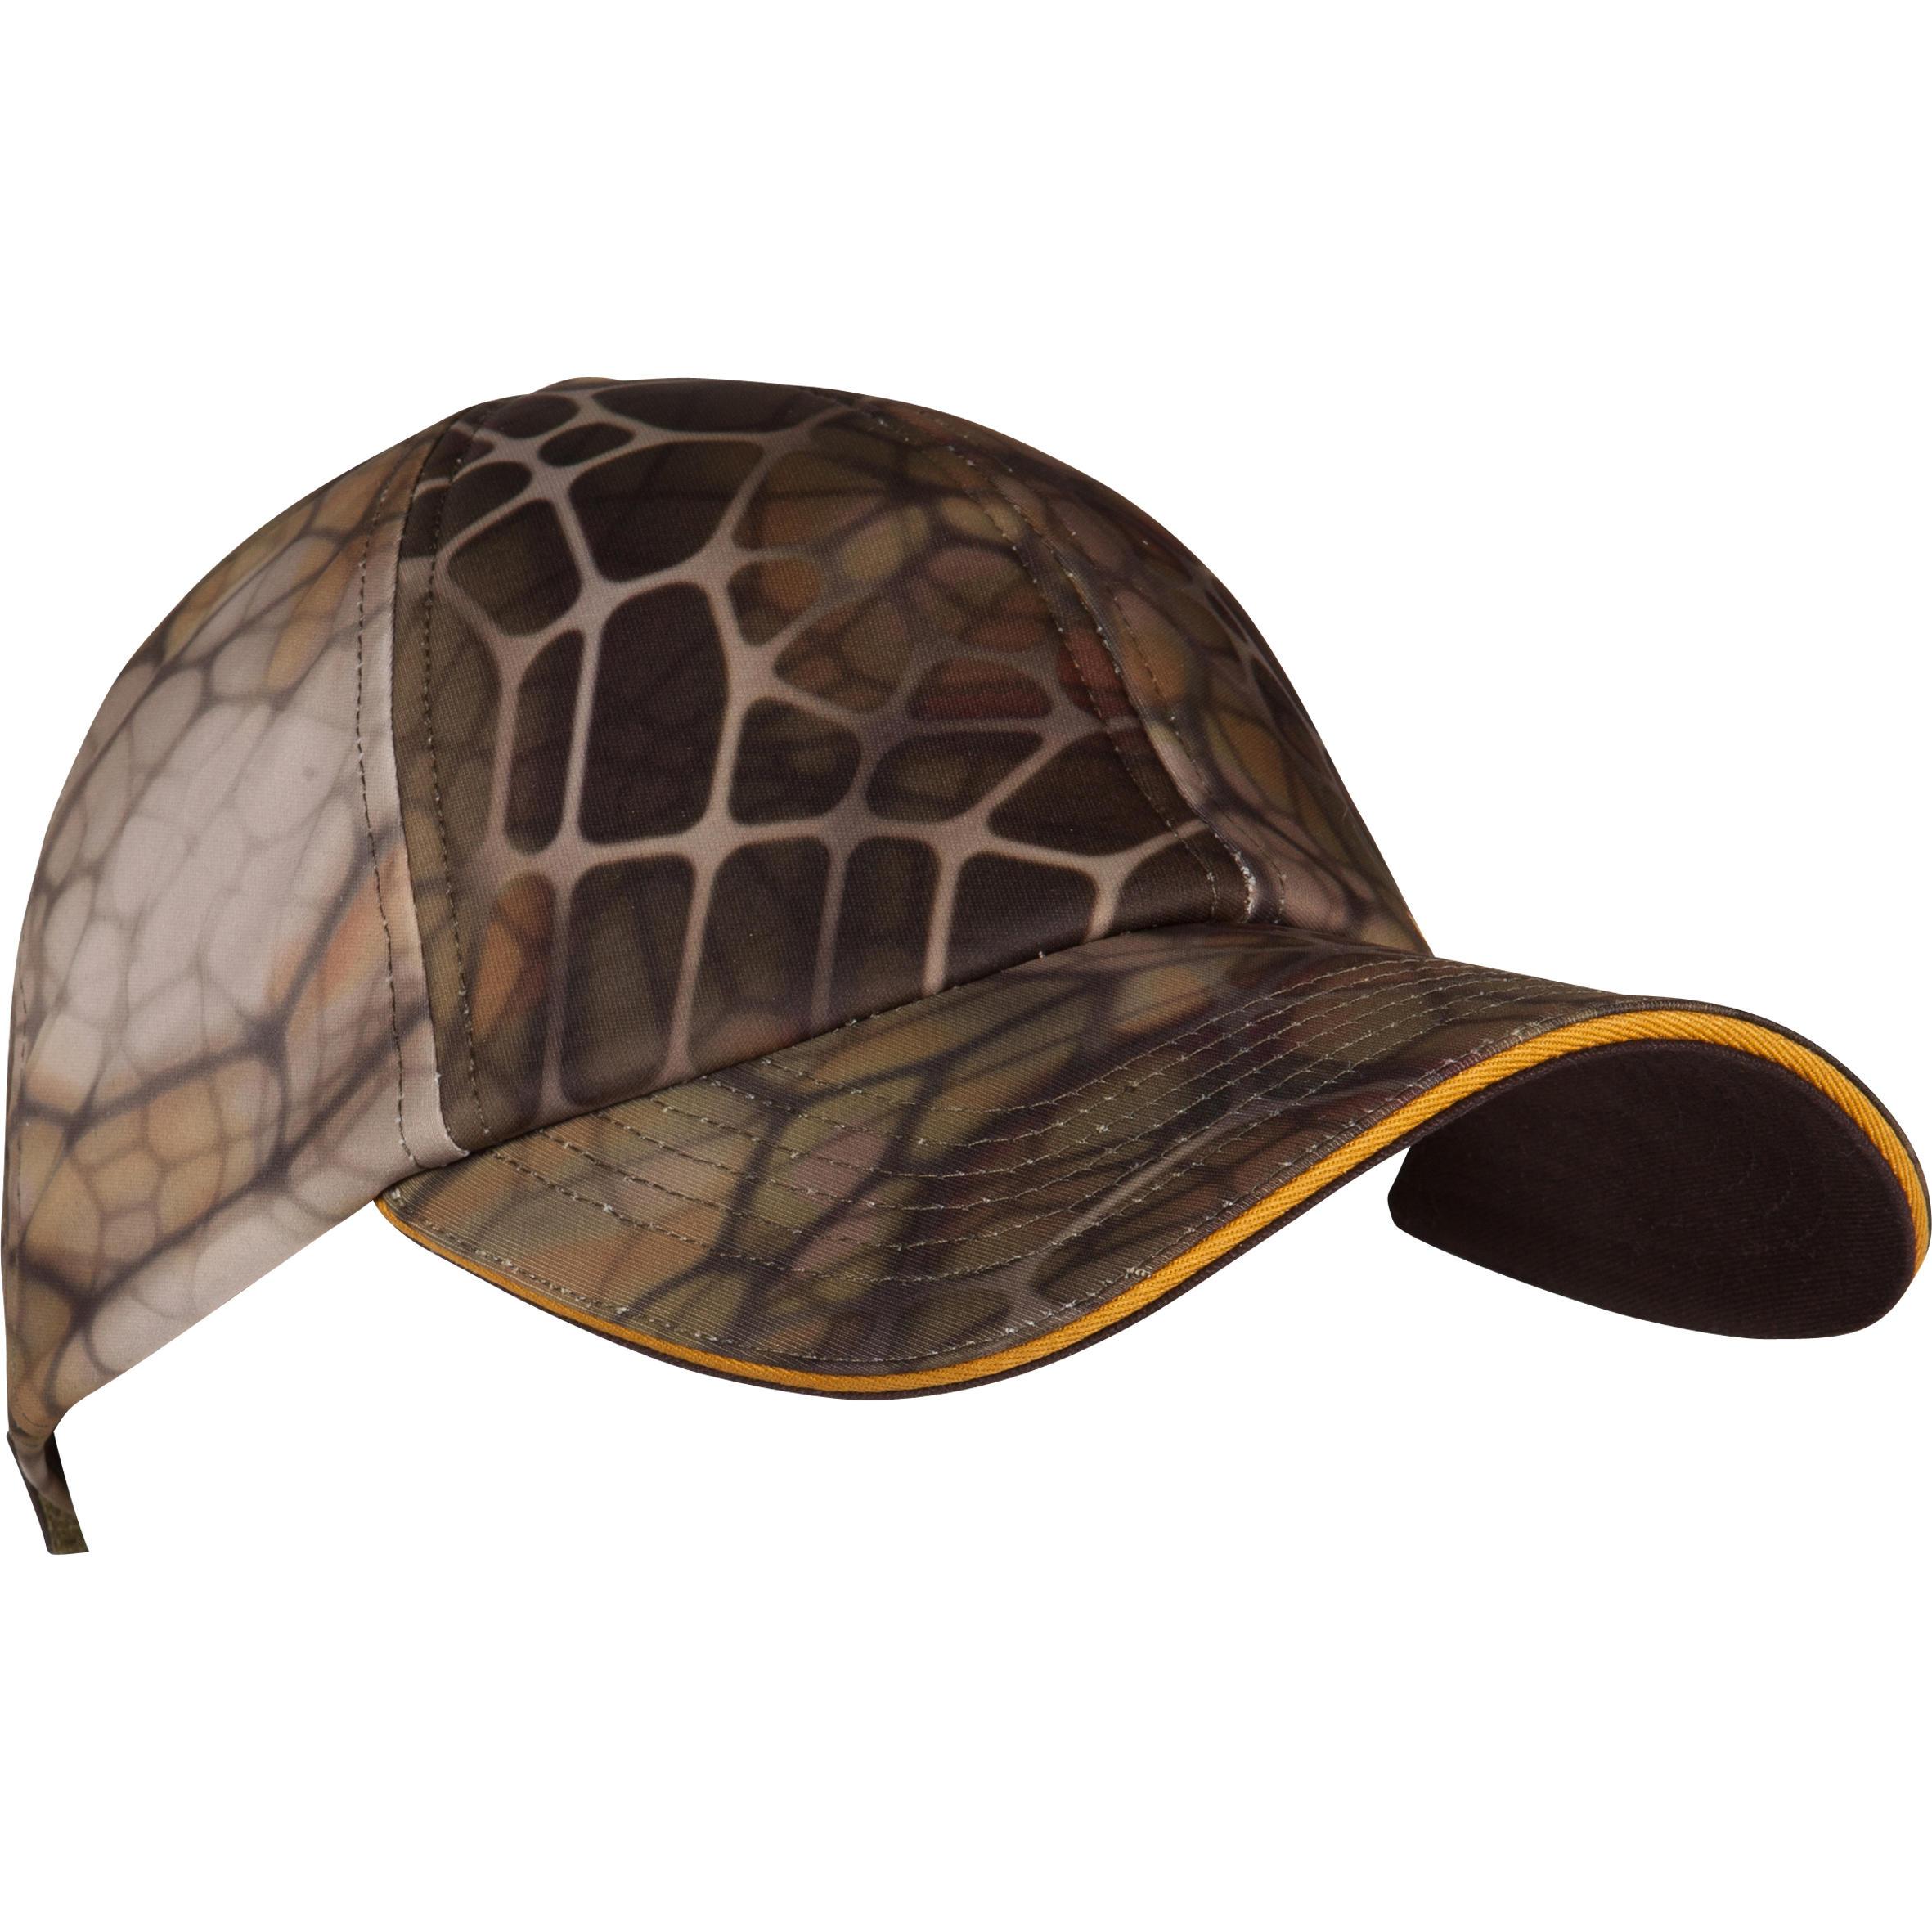 Actikam 900 Hunting Cap - Furtiv Camouflage